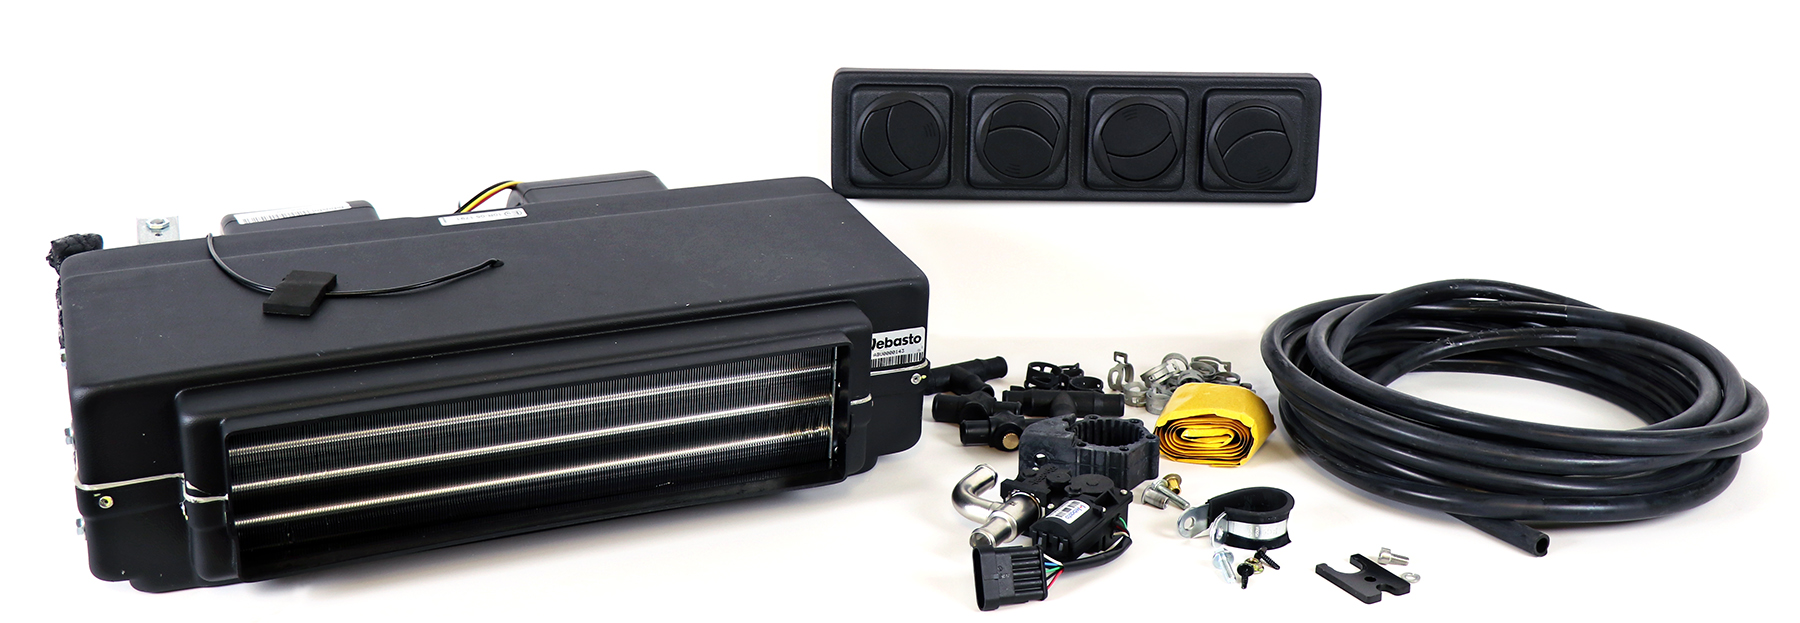 commercial-van-rear-air-conditioning-kits-hopkins-mn_2021